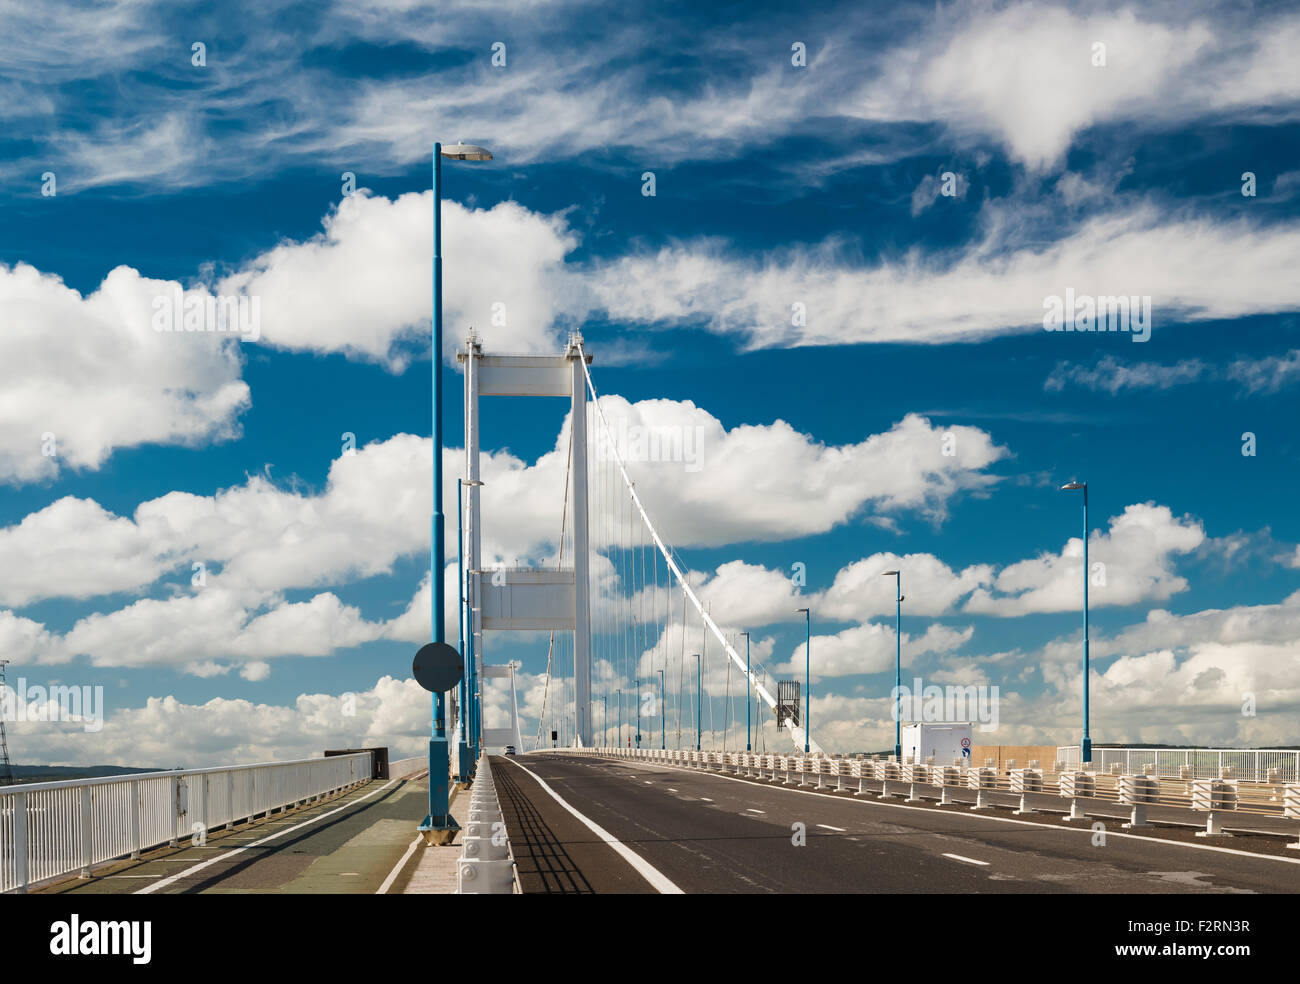 the-severn-bridge-severn-wye-bridge-betw